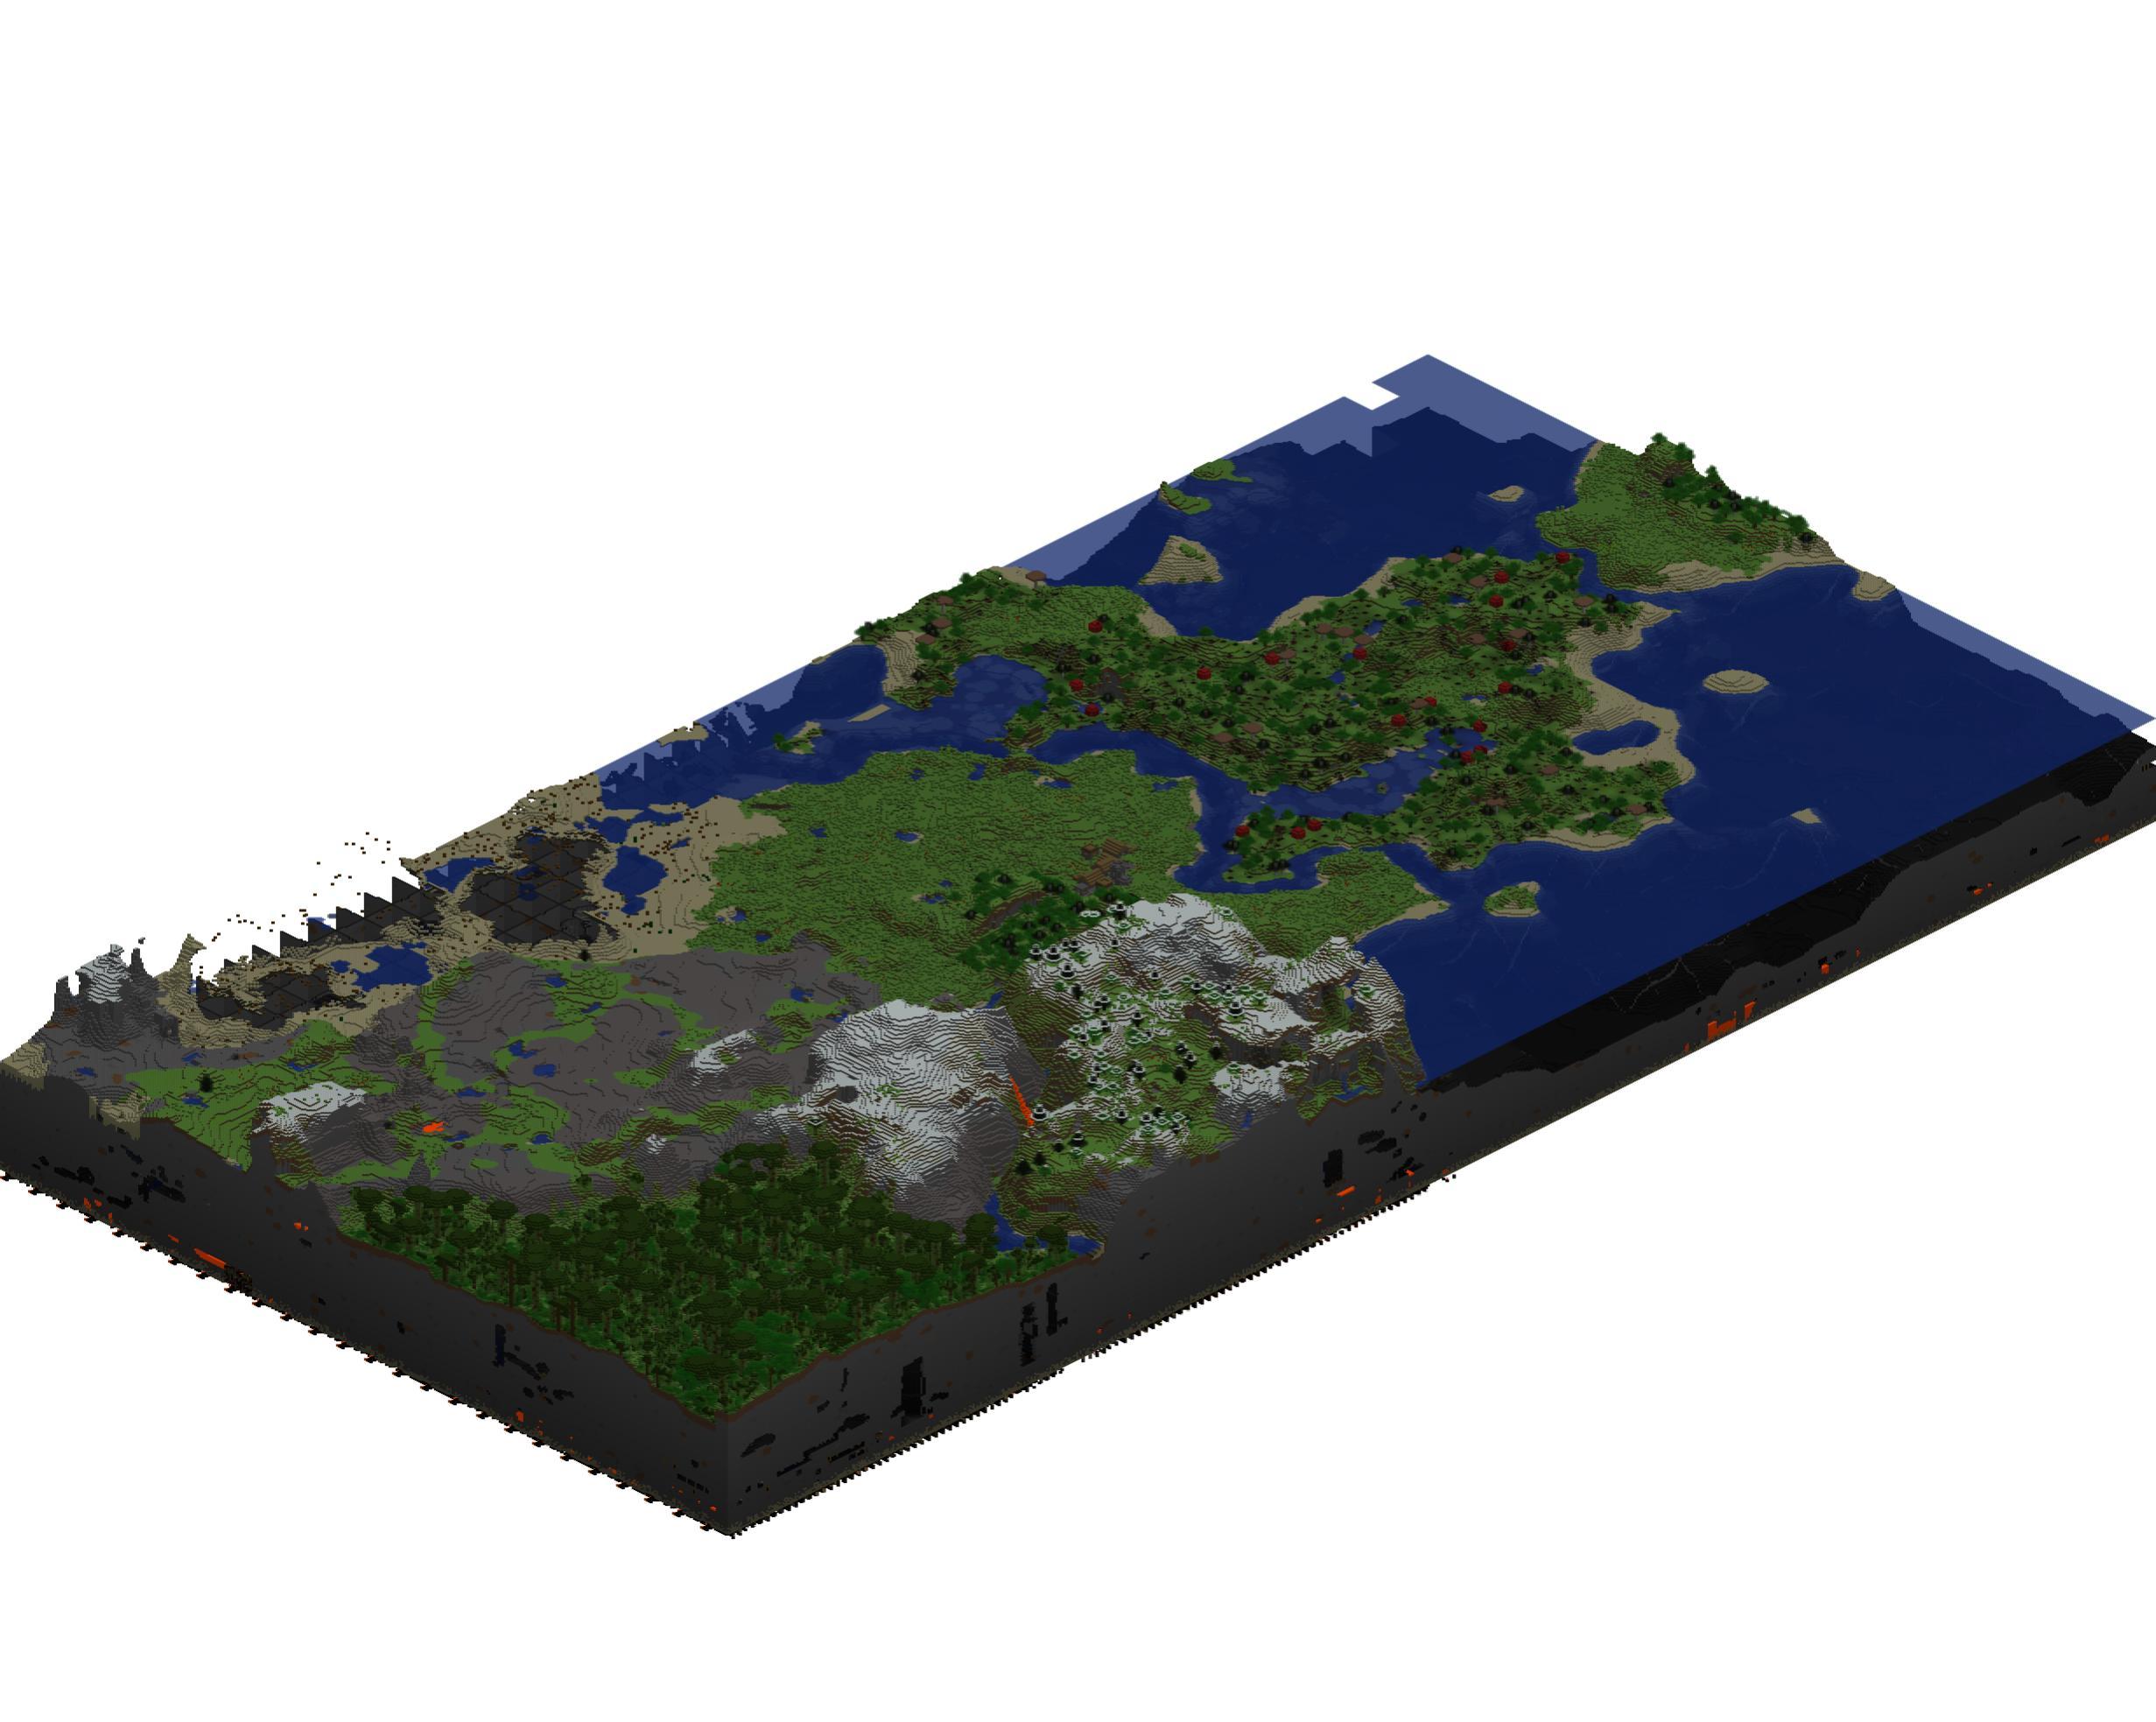 Copy of GK Server World_isometric 3800-4800x 700-1200z.jpg